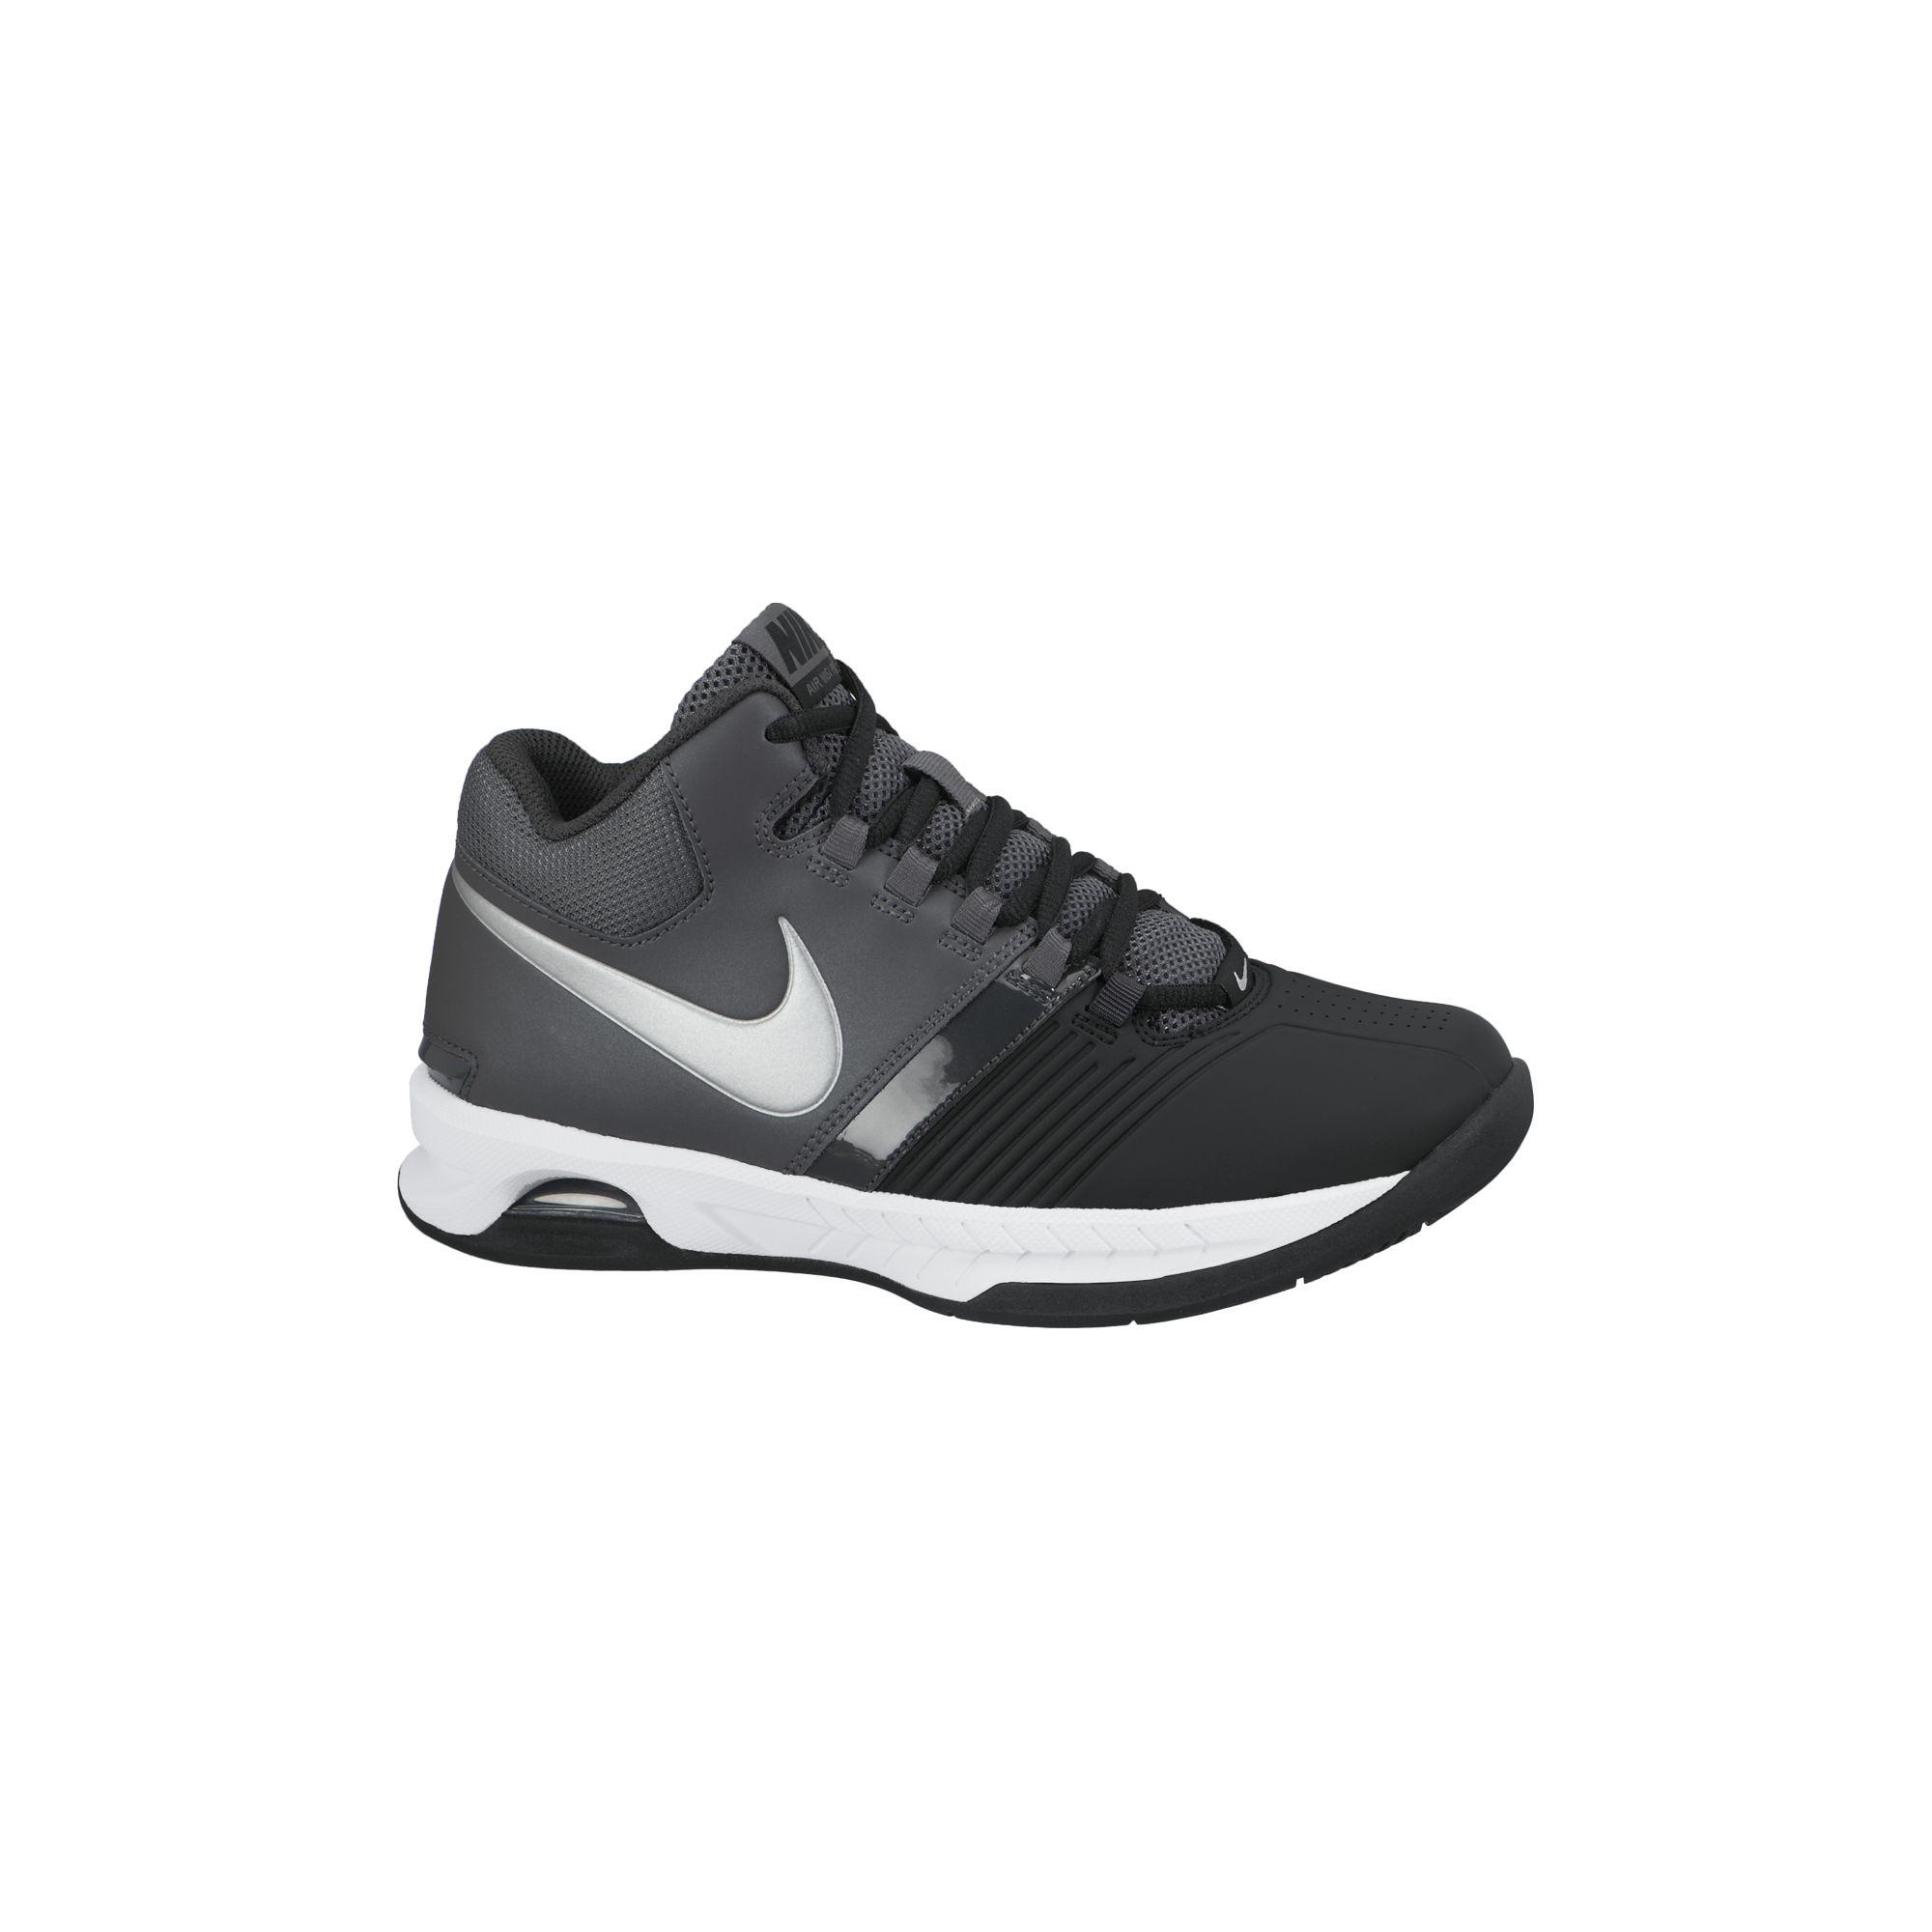 ef7ebf22c4b Women s Nike Air Visi Pro V Basketball Shoe - Sieverts Sporting Goods